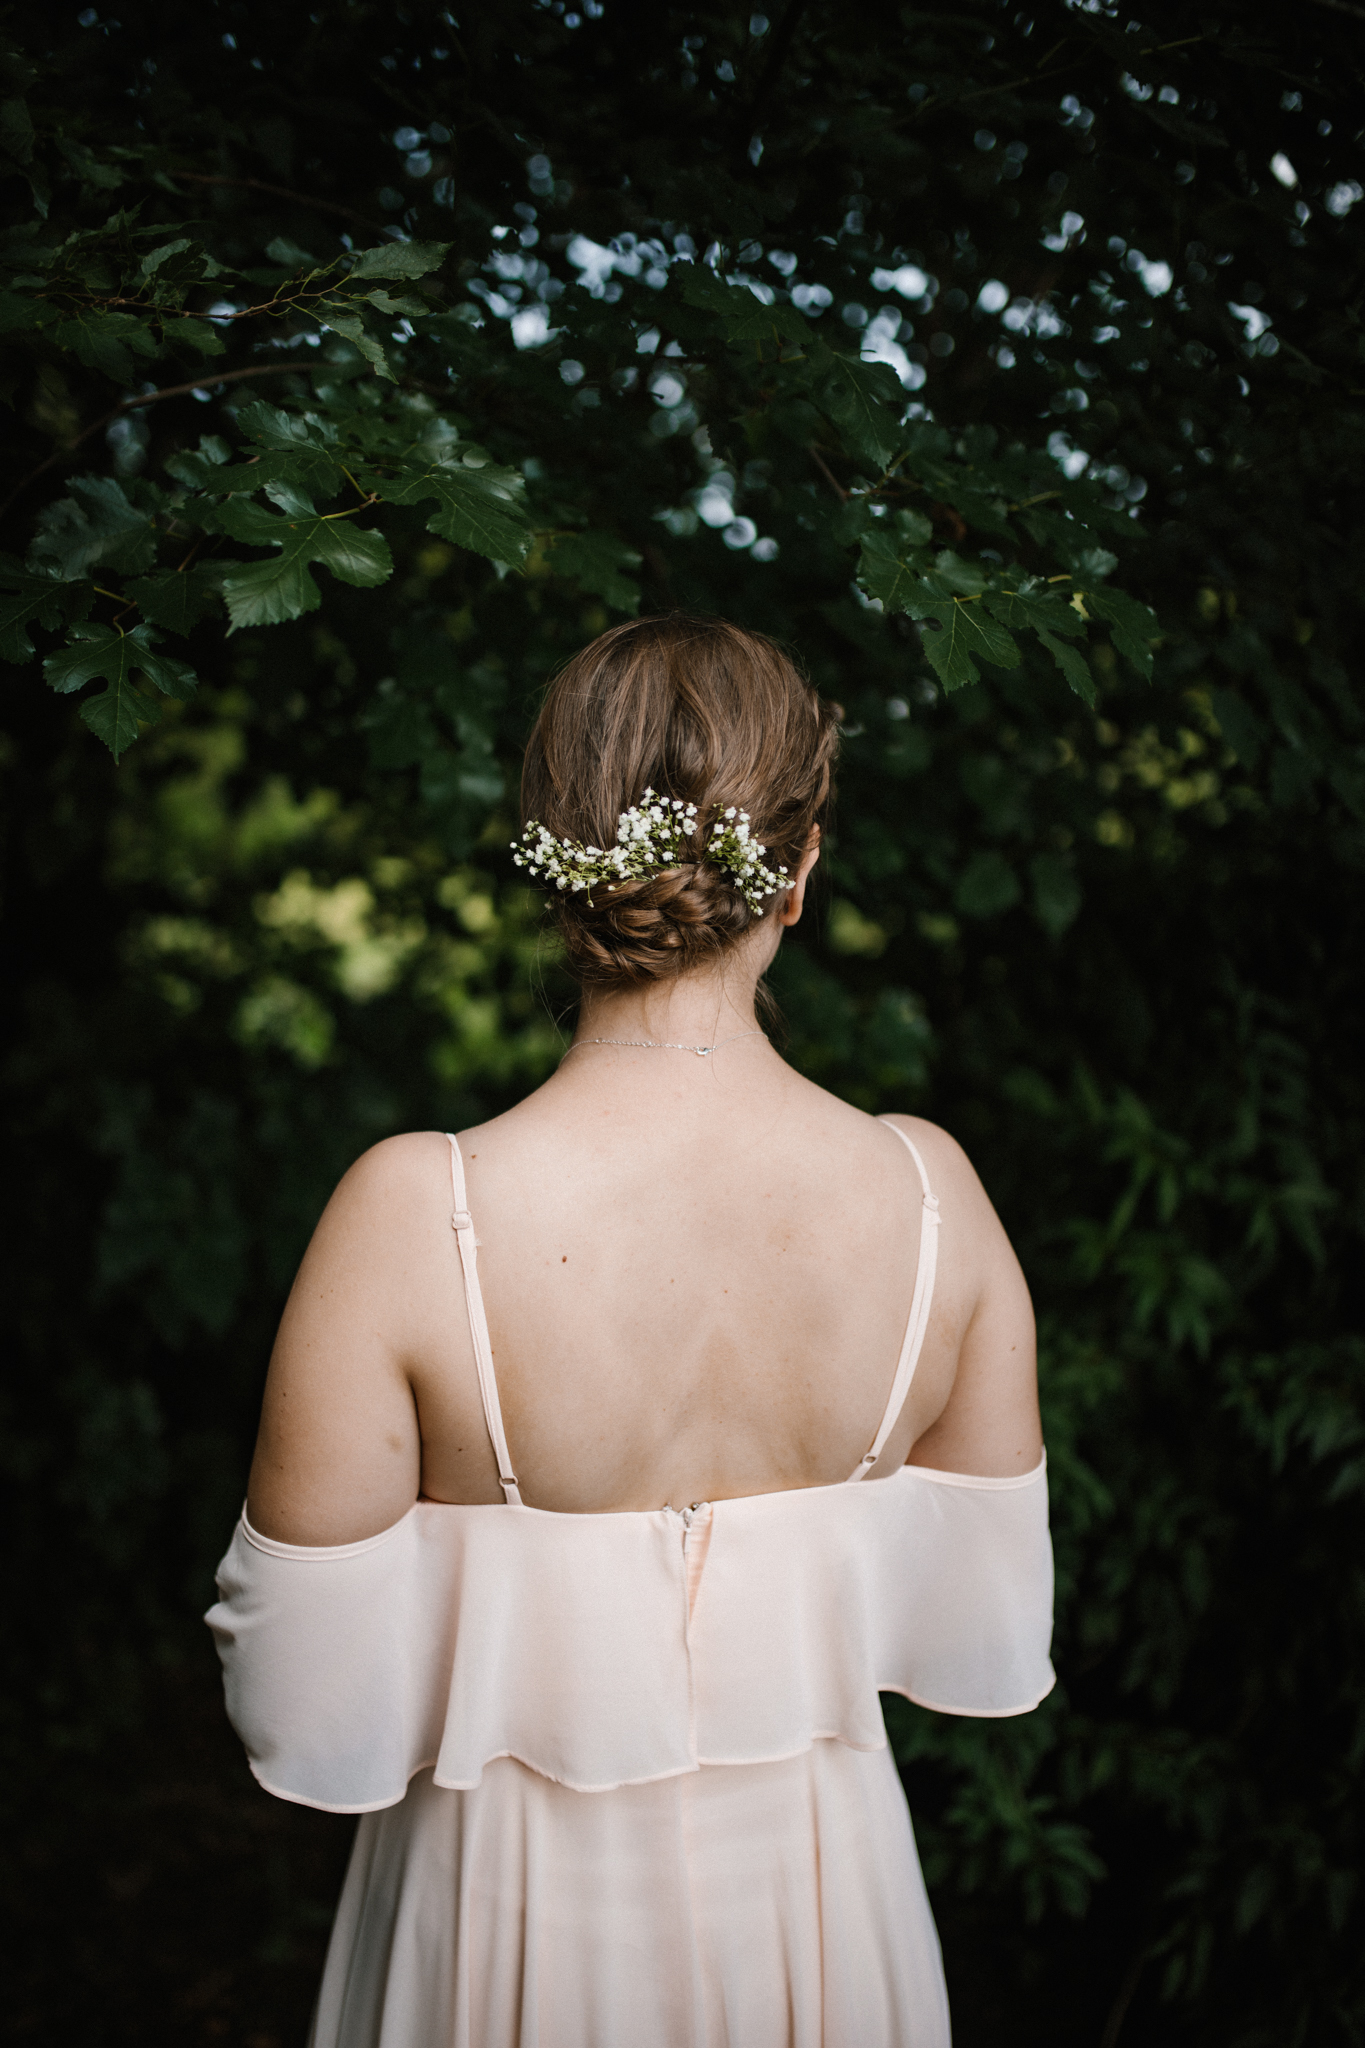 dorota_dwight_richmond_backyard_wedding-57.jpg